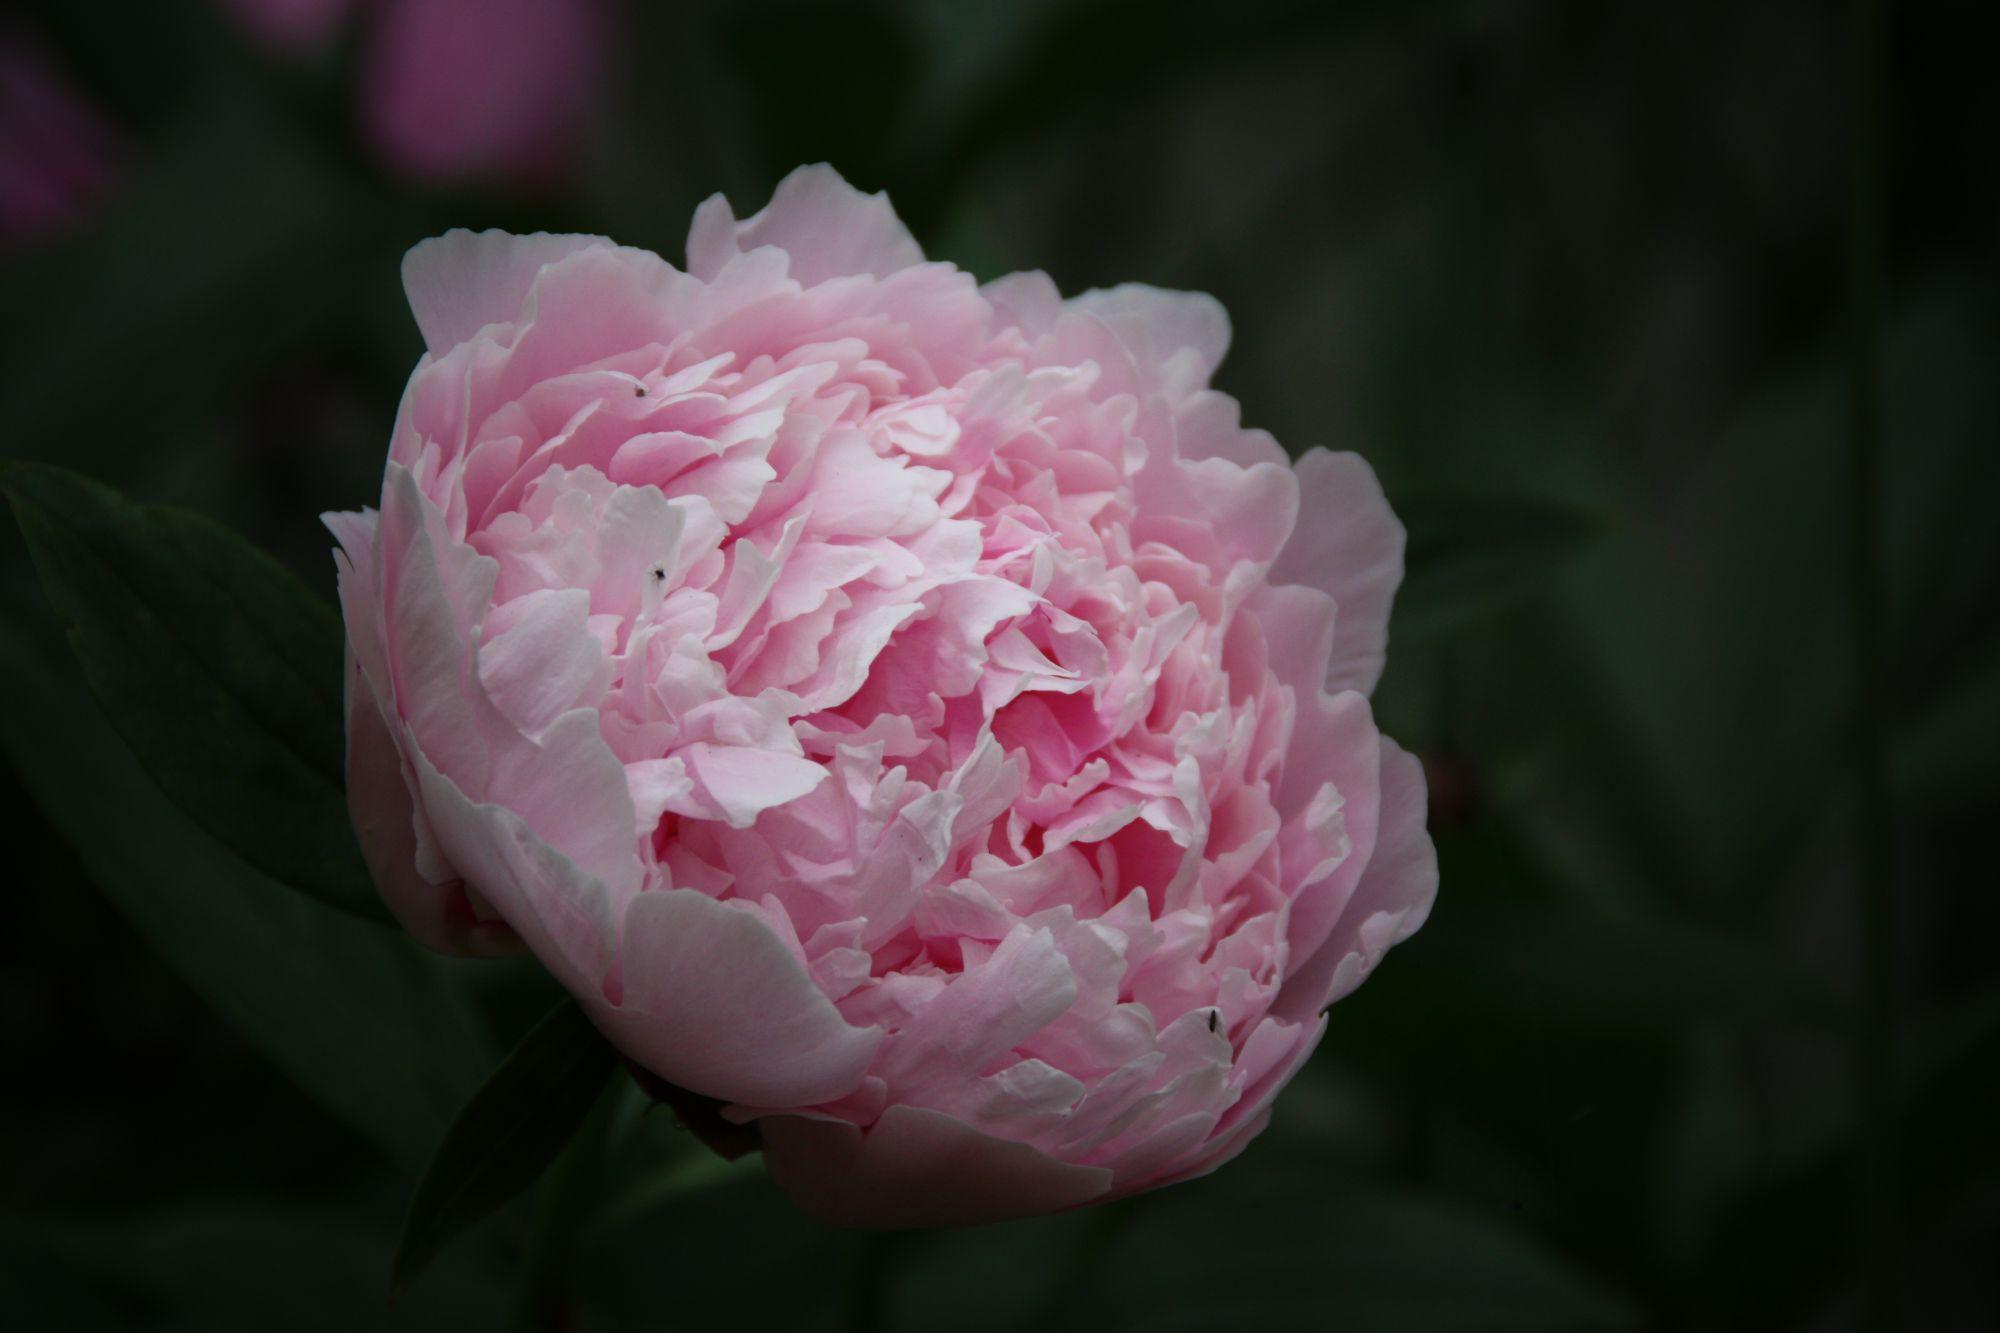 05) Flowers